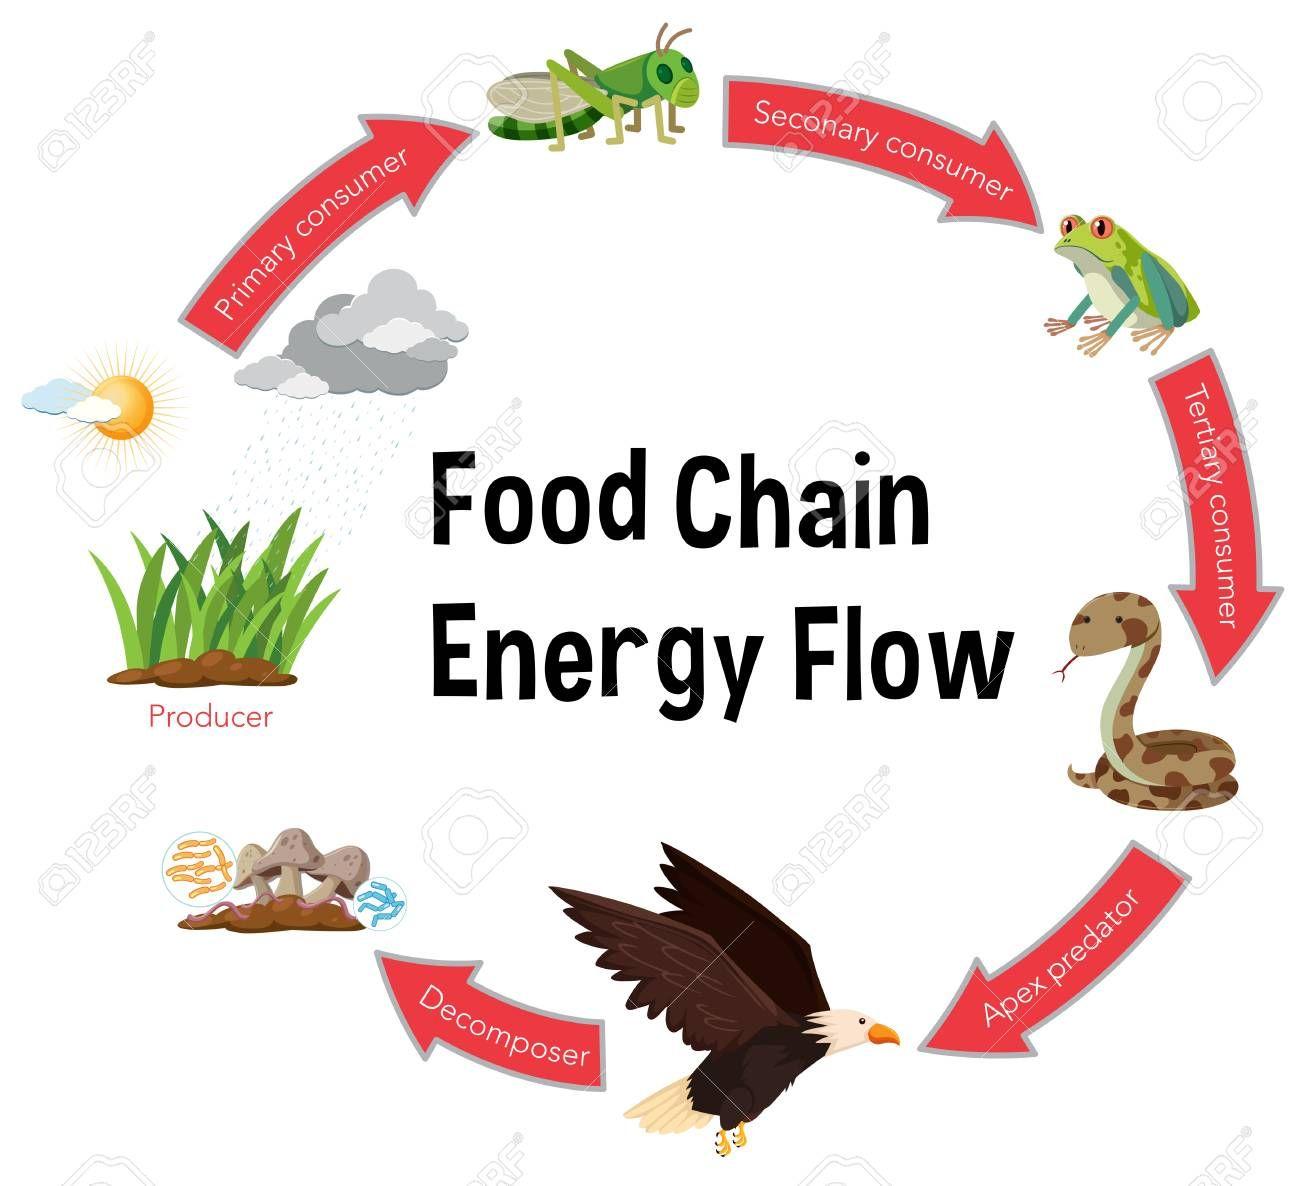 Food Chain Energy Flow Diagram Illustration Sponsored Energy Chain Food Illustration Diagram Food Chain Energy Flow Energy